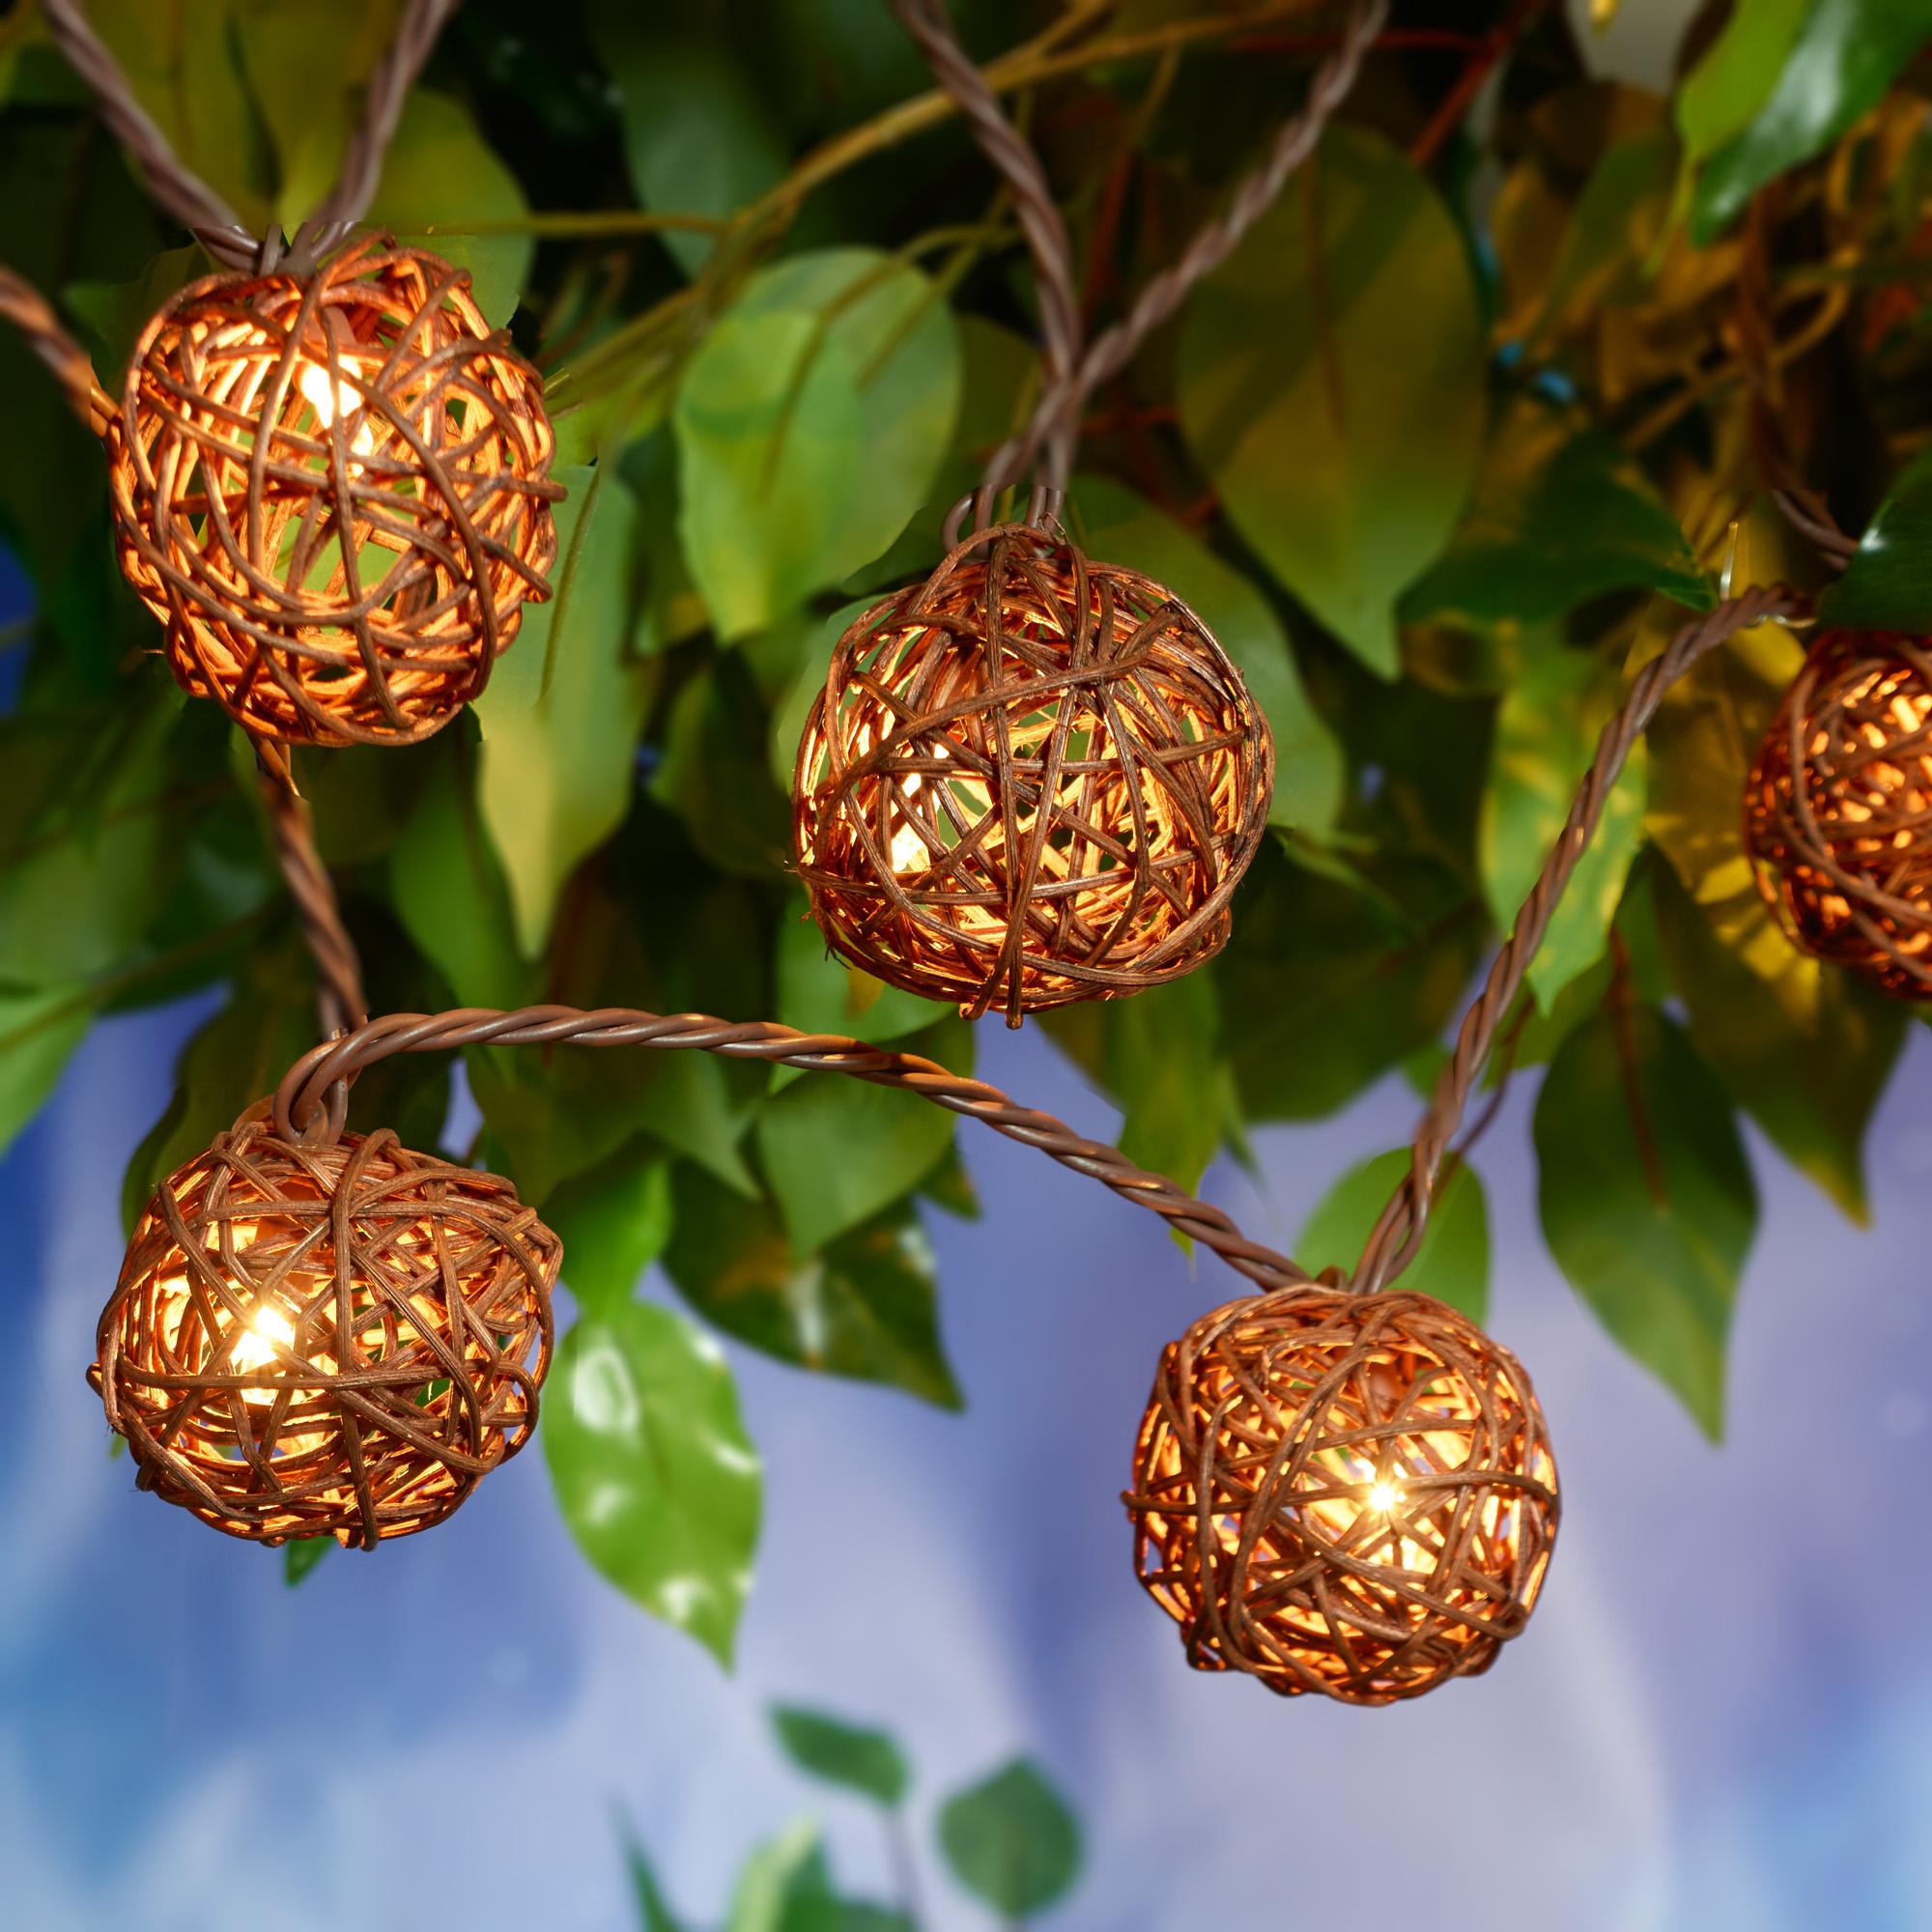 Better Homes & Gardens 20ct (2x10) Wicker Ball String Lights